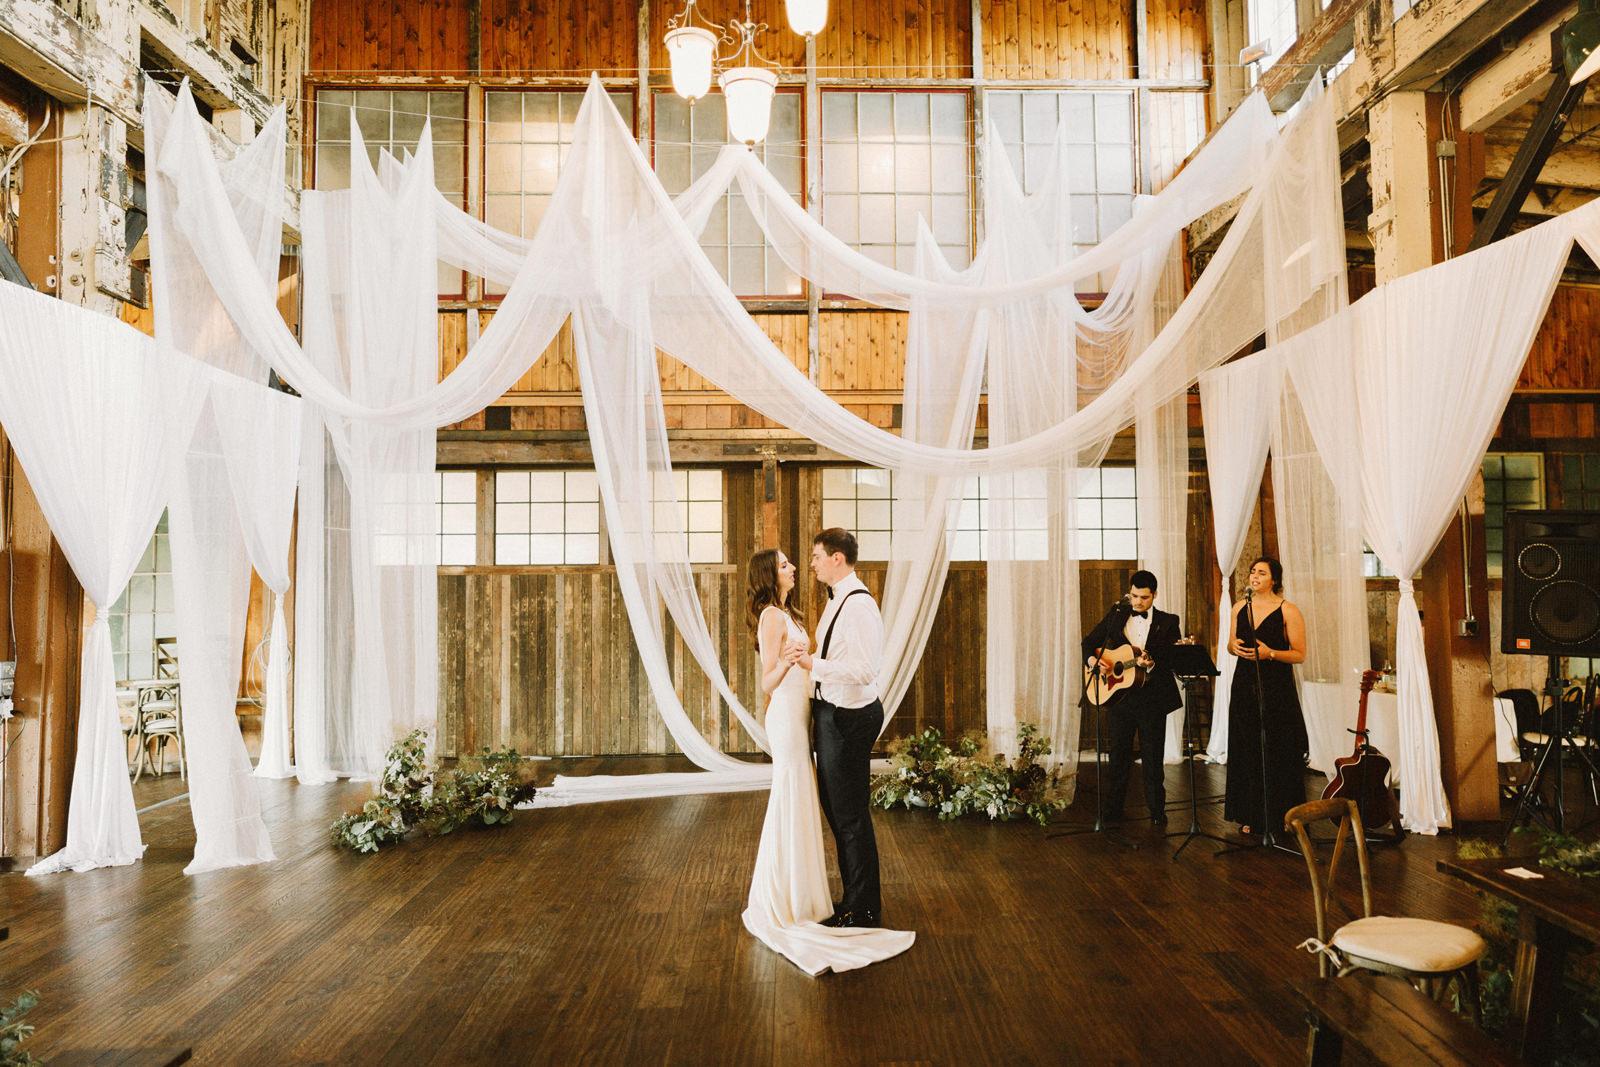 sodo-park-wedding-074 SODO PARK WEDDING